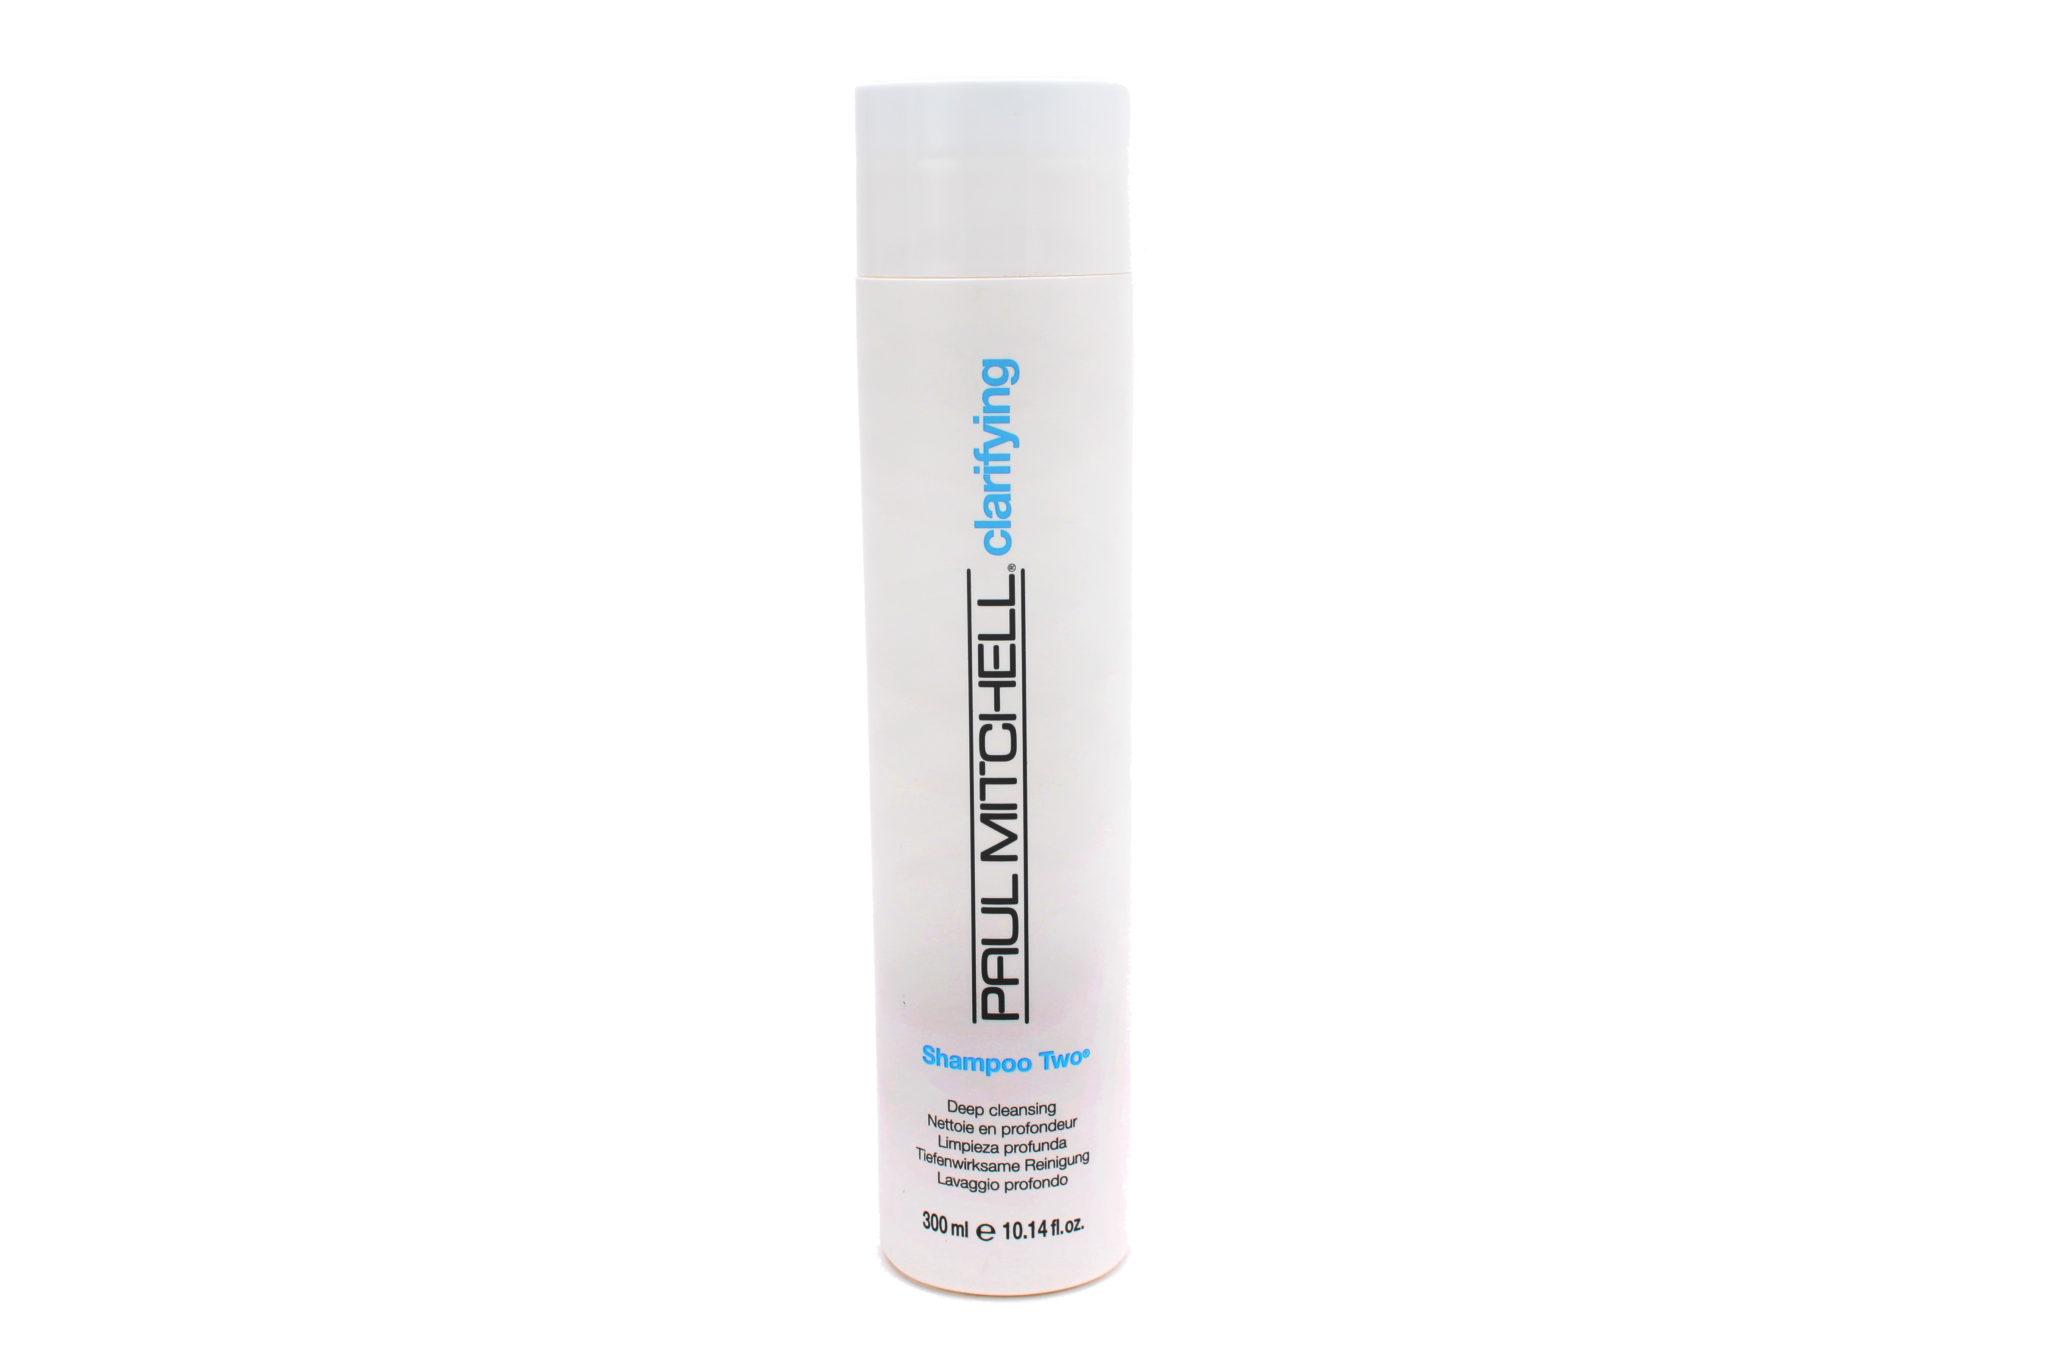 43107 Shampoo Two 10.14 oz Front